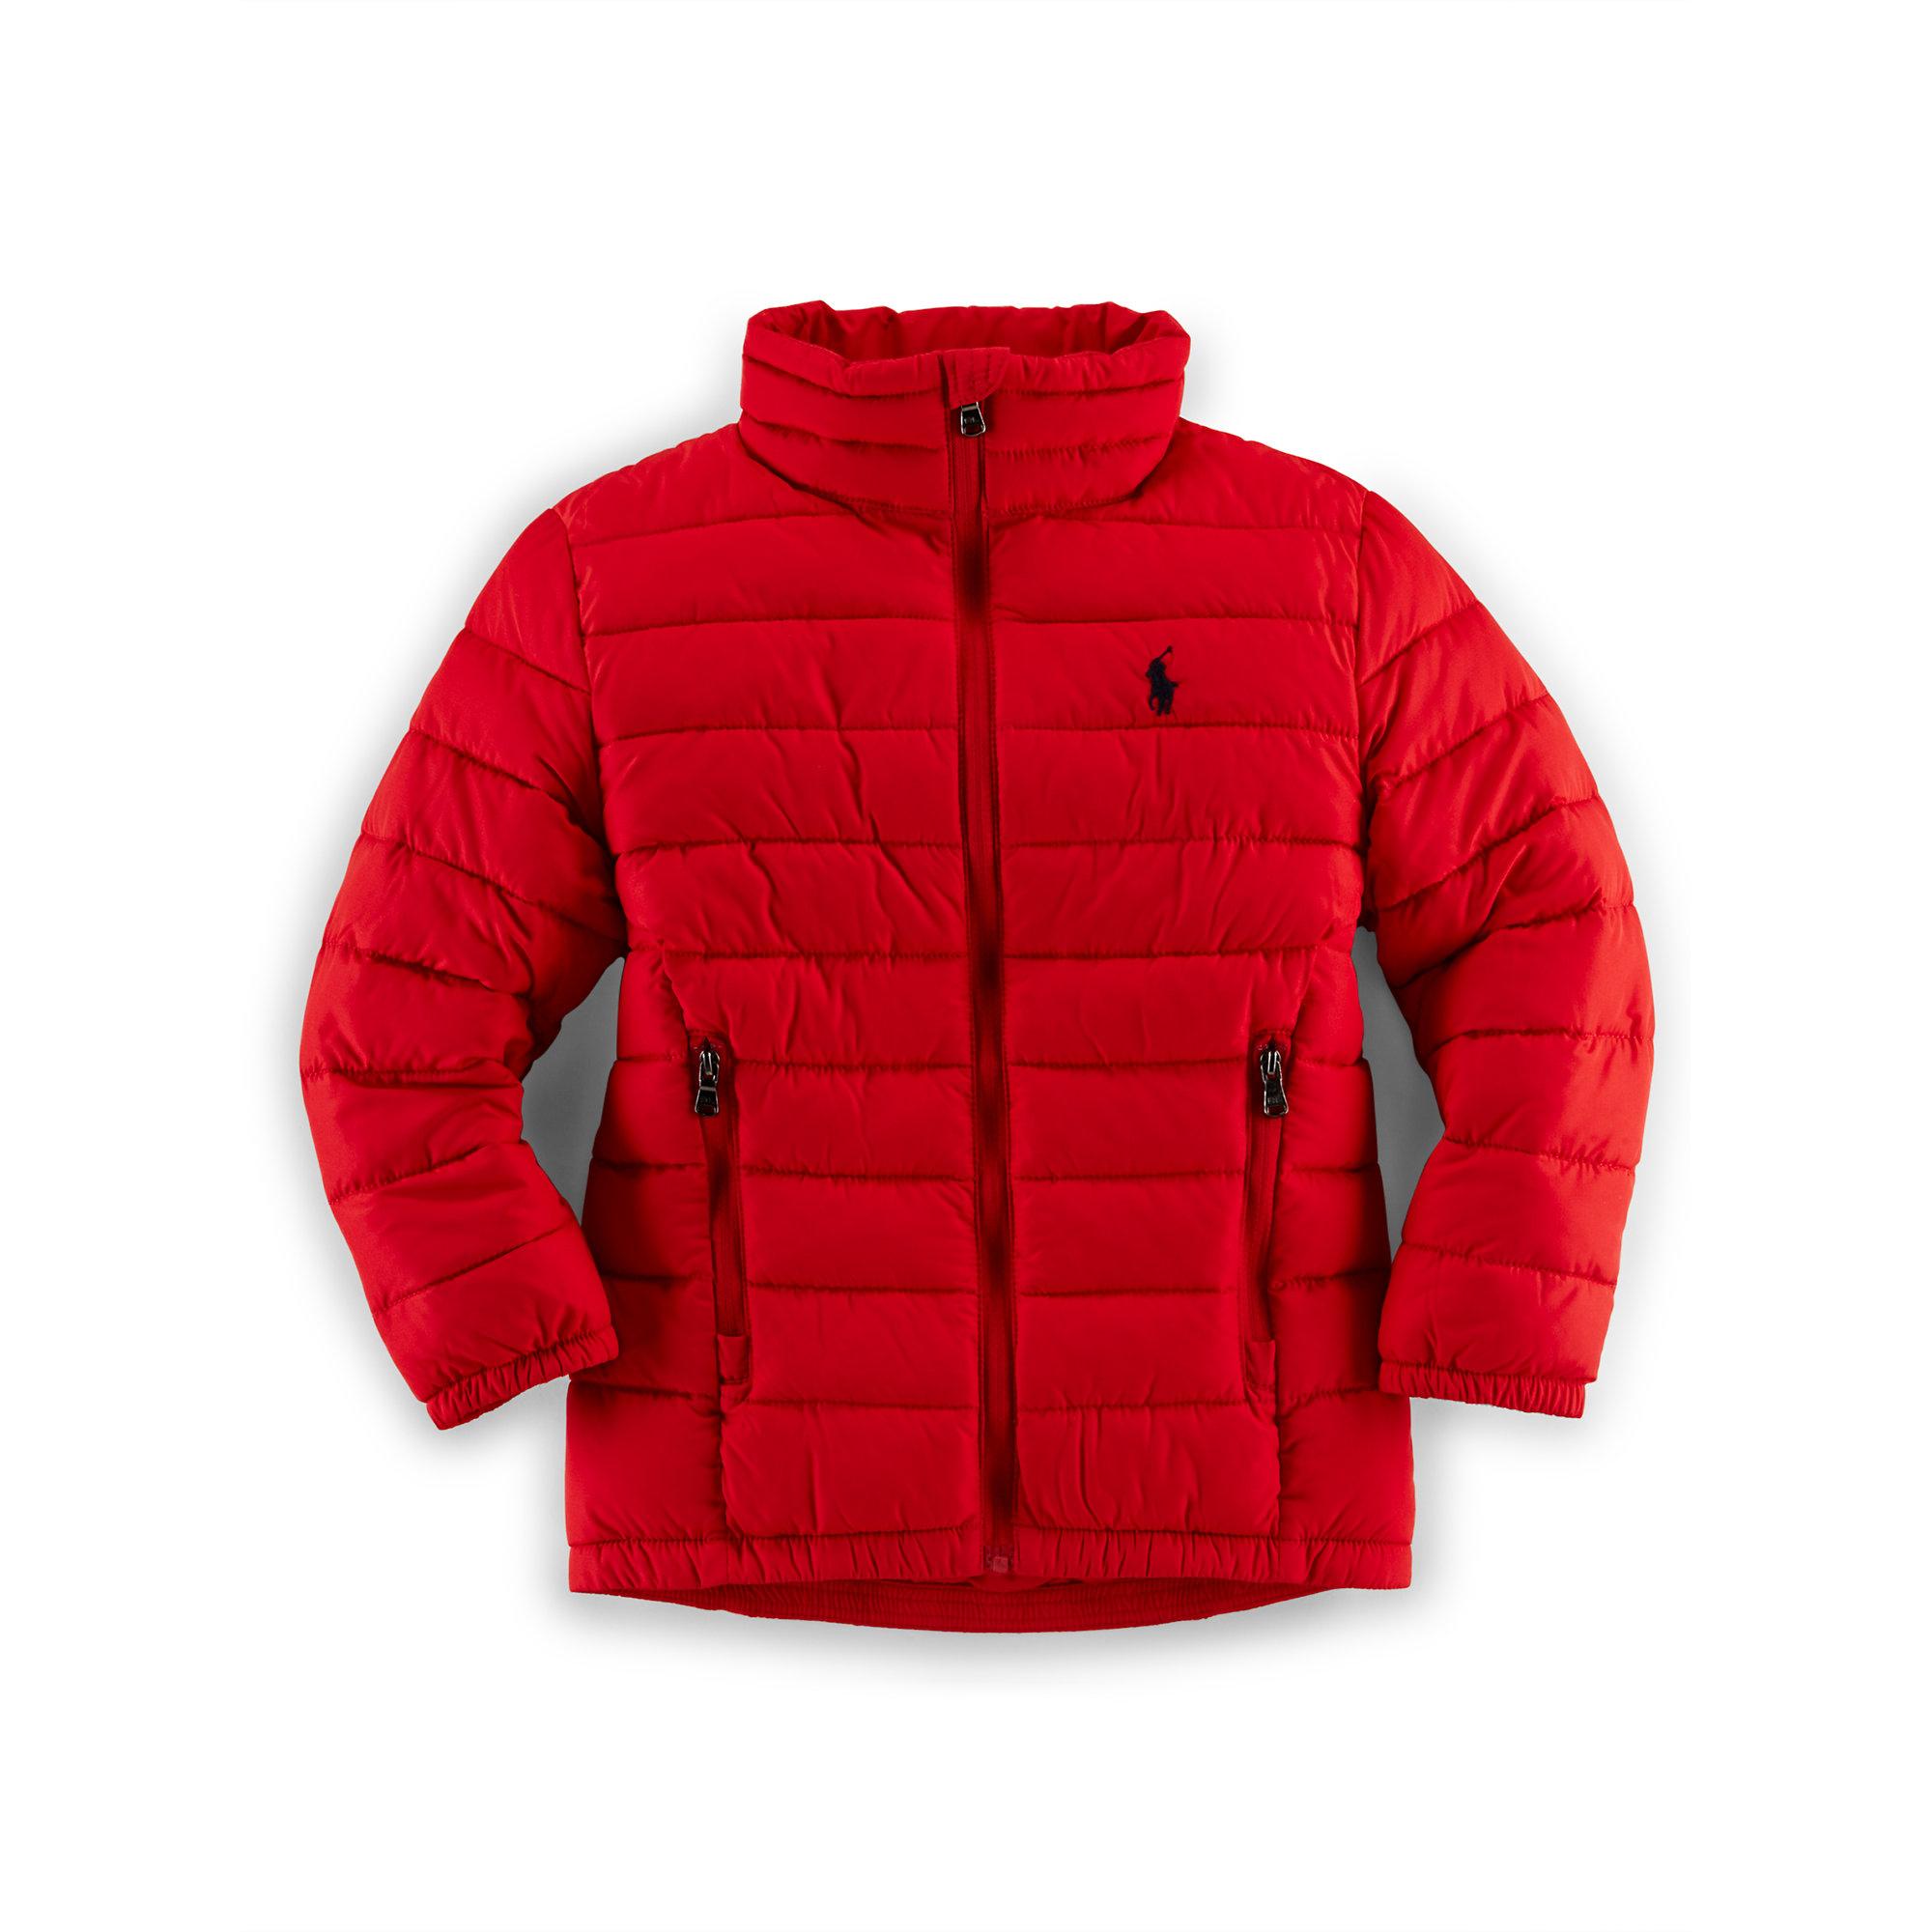 ralph lauren lightweight puffer jacket in red lyst. Black Bedroom Furniture Sets. Home Design Ideas